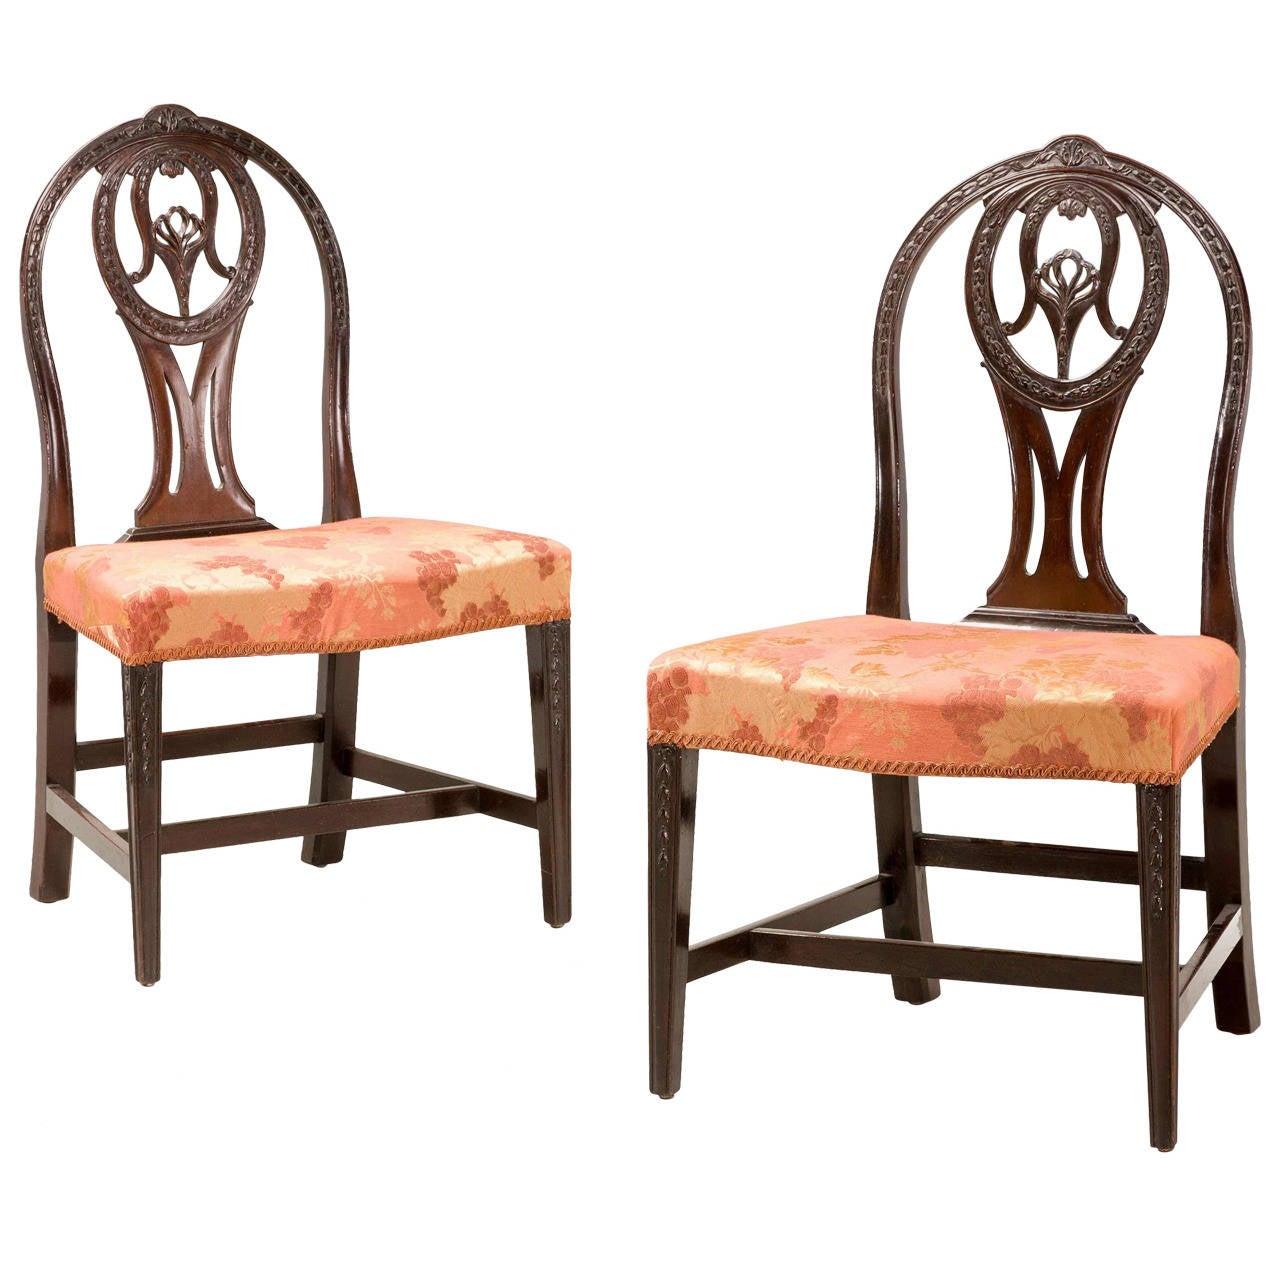 Pair of george iii irish mahogany side chairs for sale at for Side chairs for sale